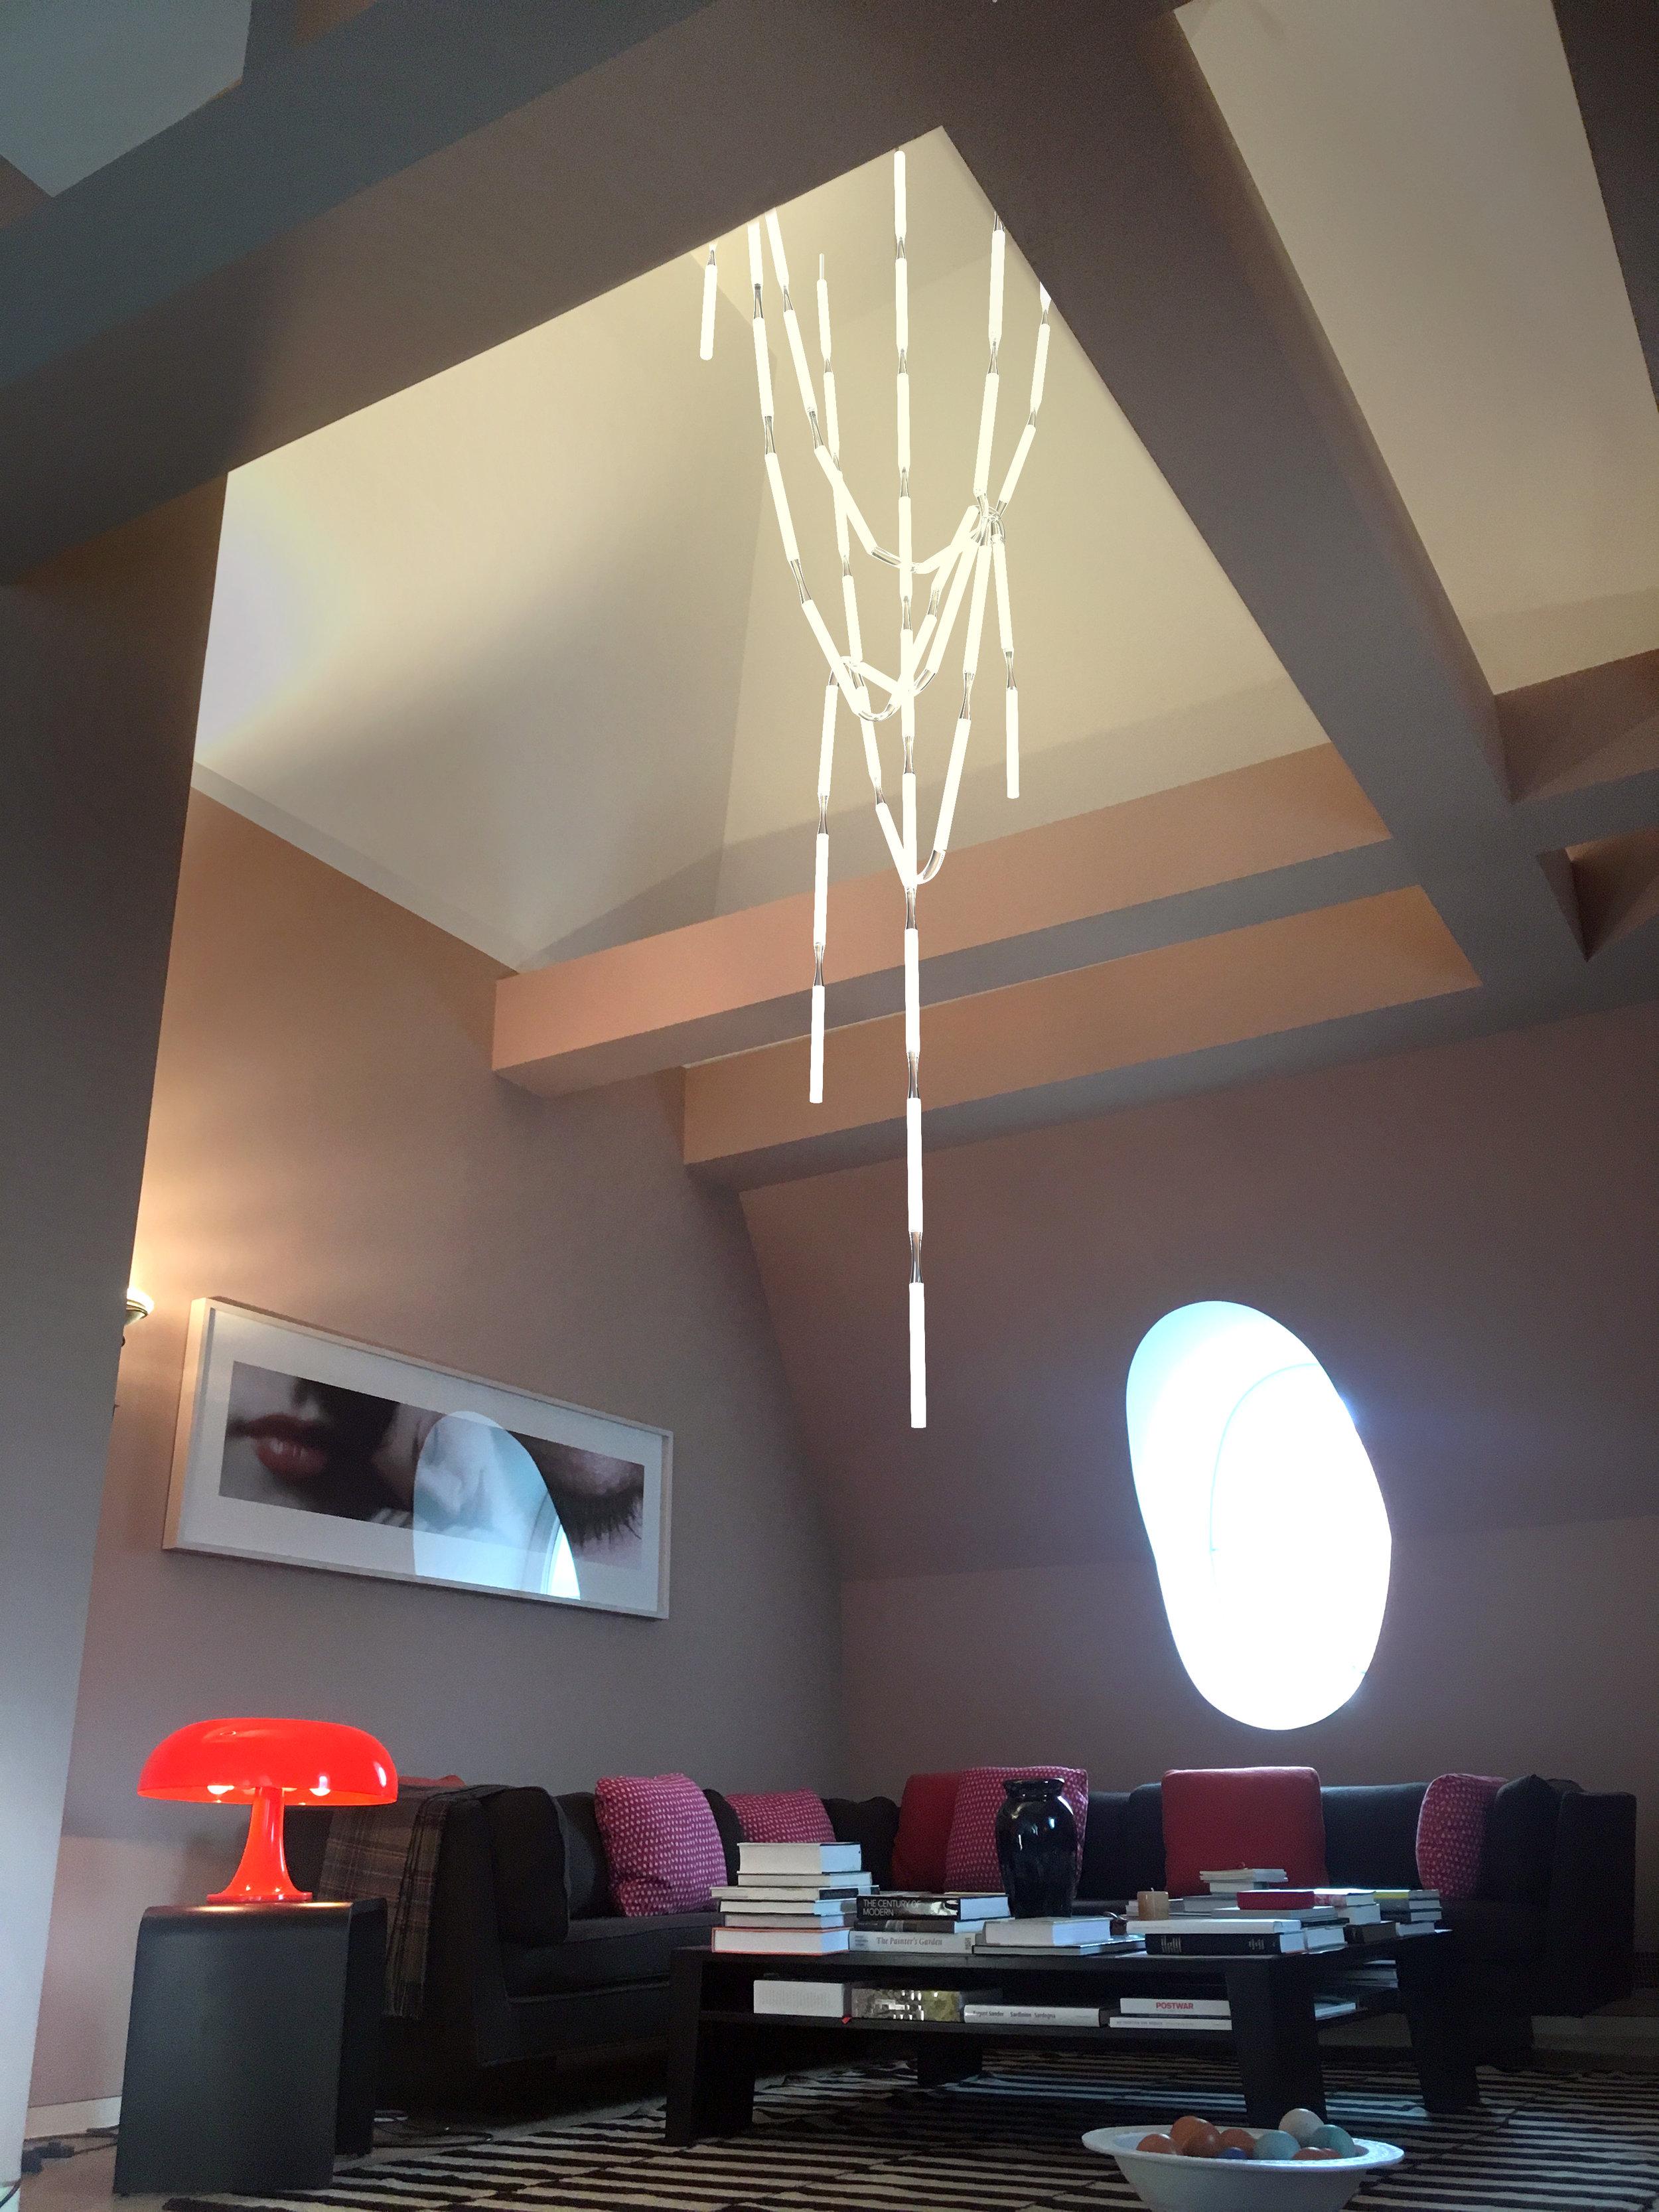 AKTTEM-Rope-Light-Chandelier-VK-Penthouse.jpg